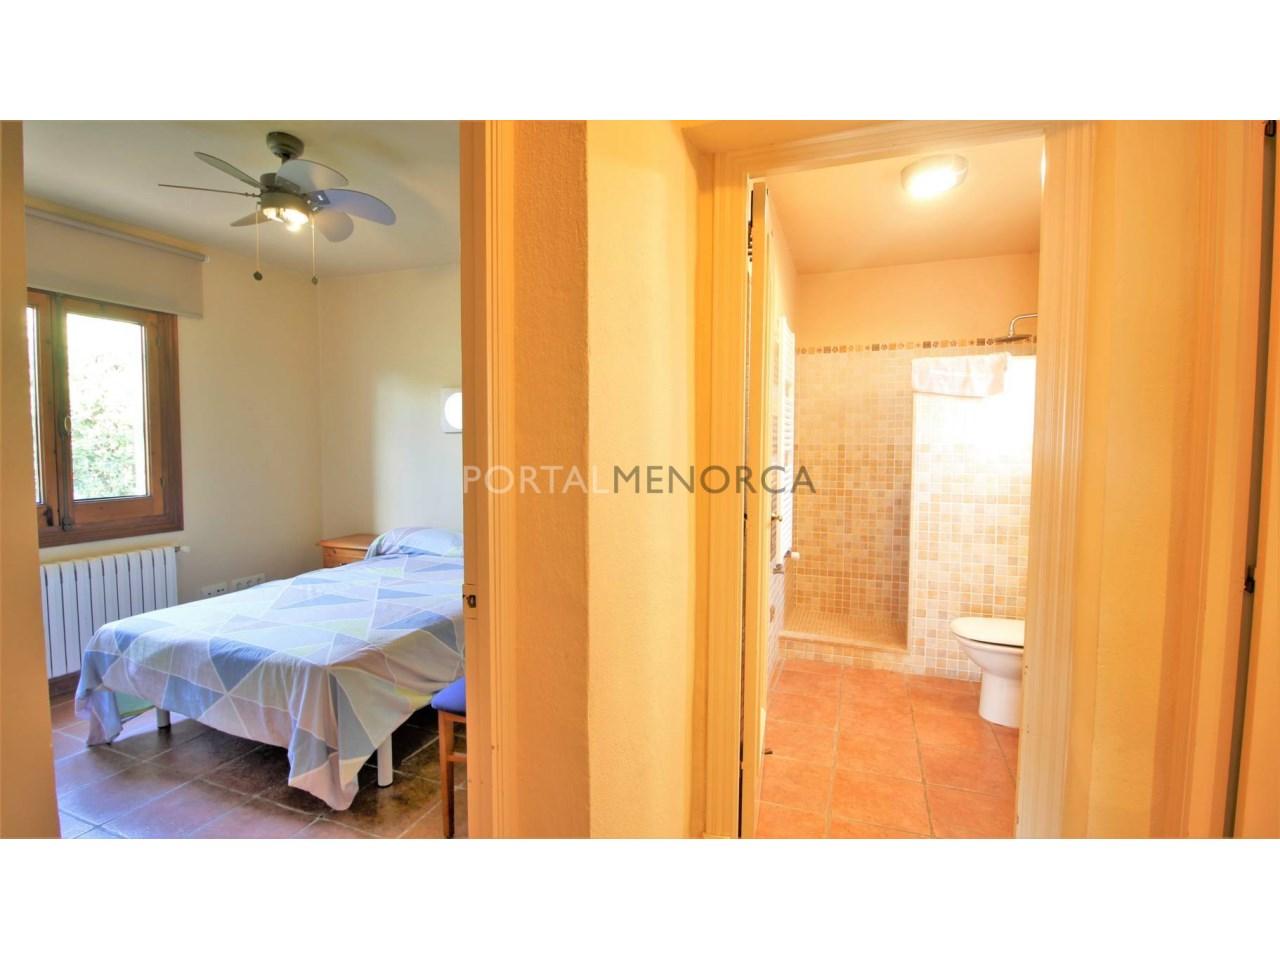 Re_ 11 dormitorio 4 (3)